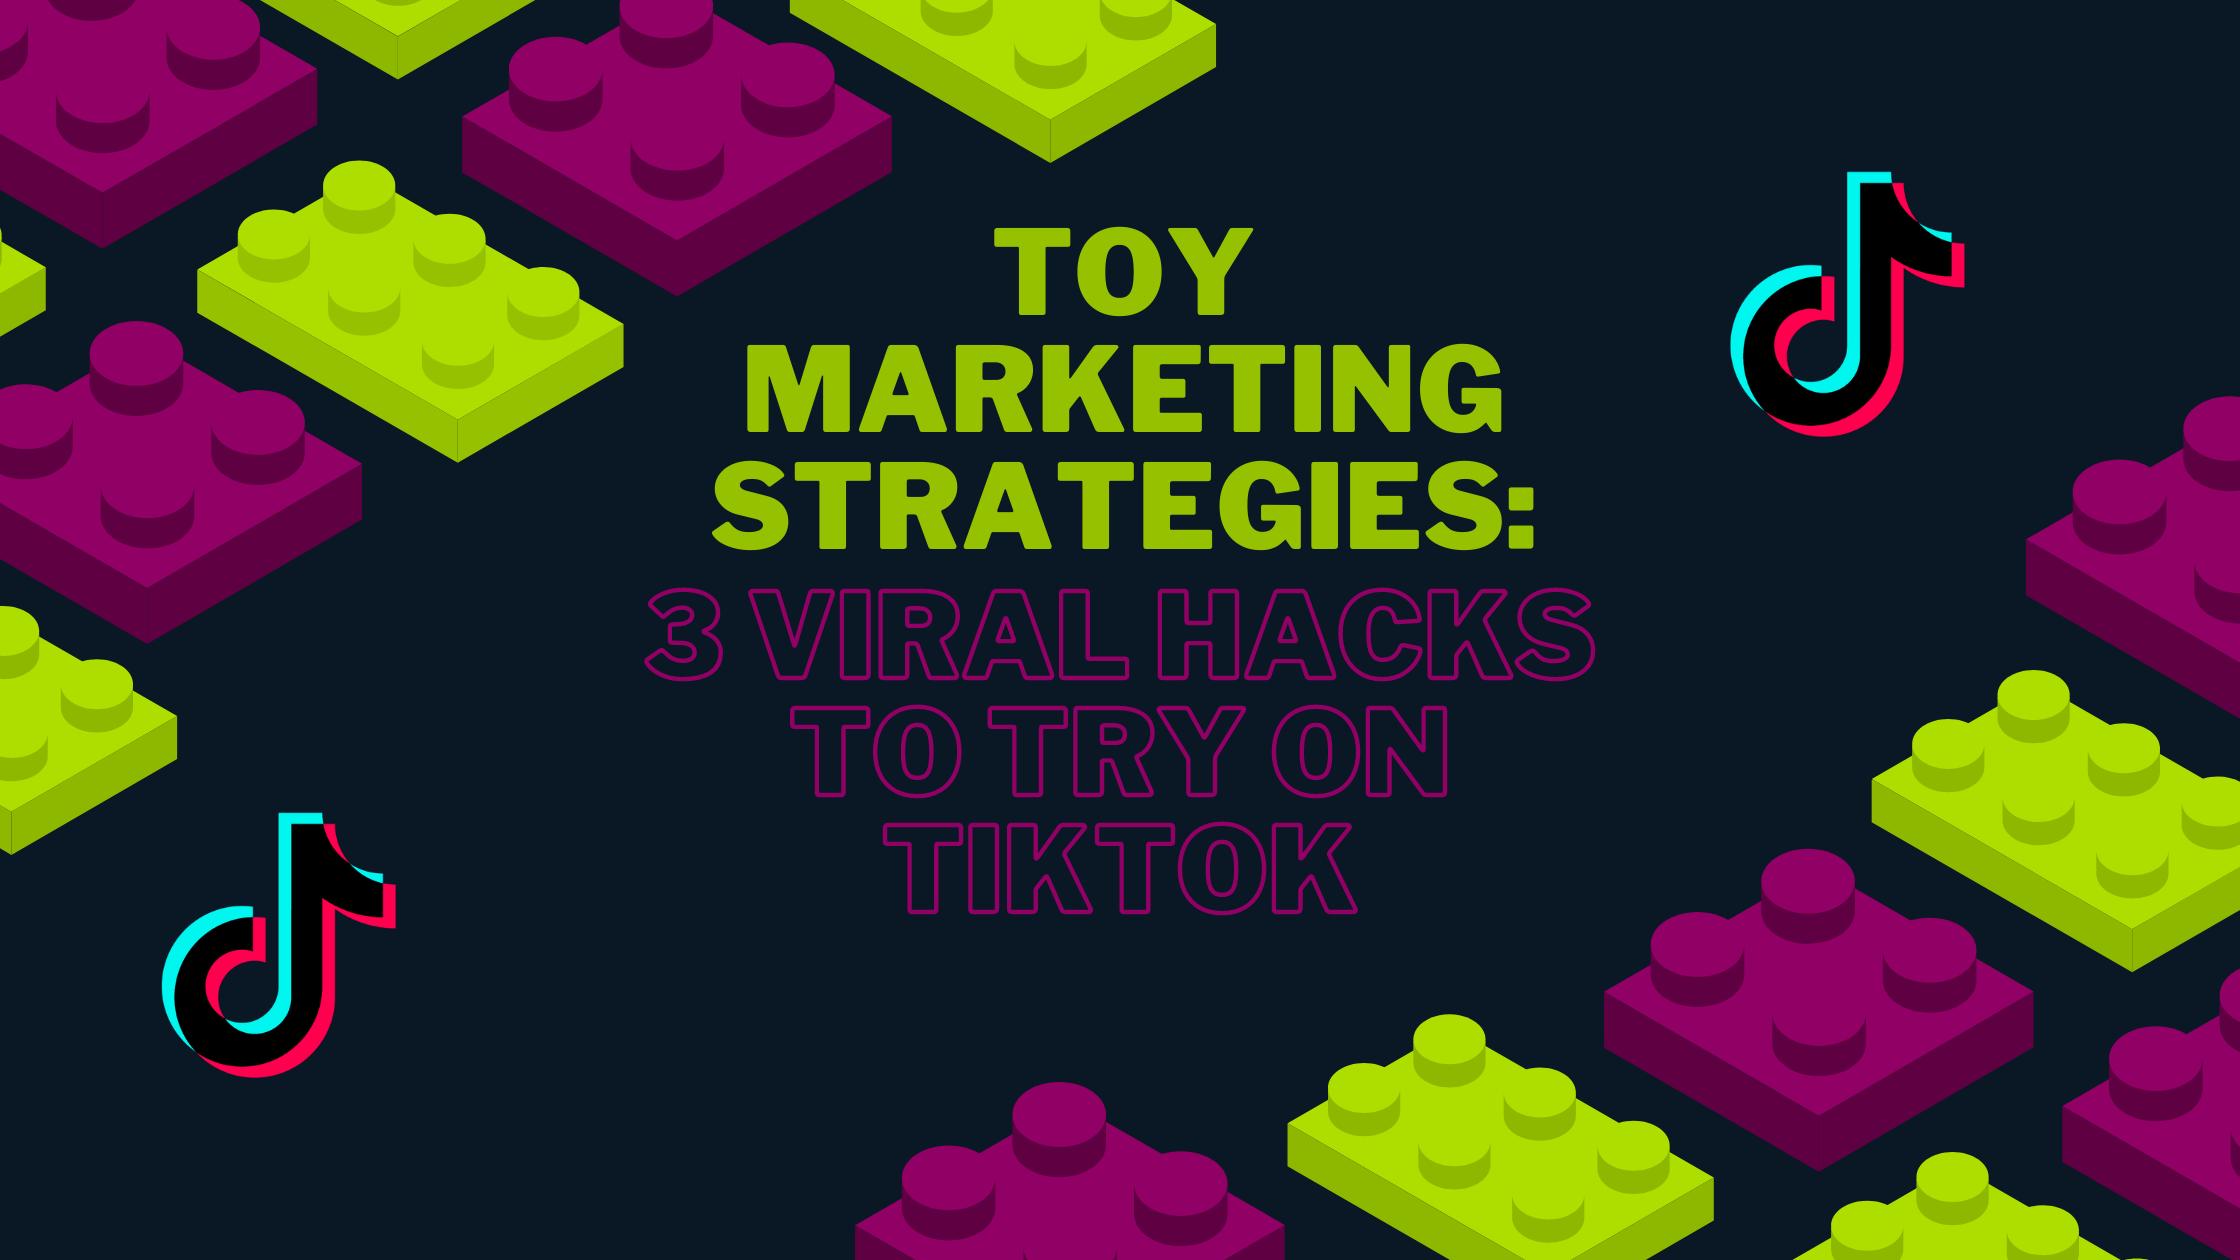 Toy Marketing Strategies: 3 Viral Hacks To Try On TikTok